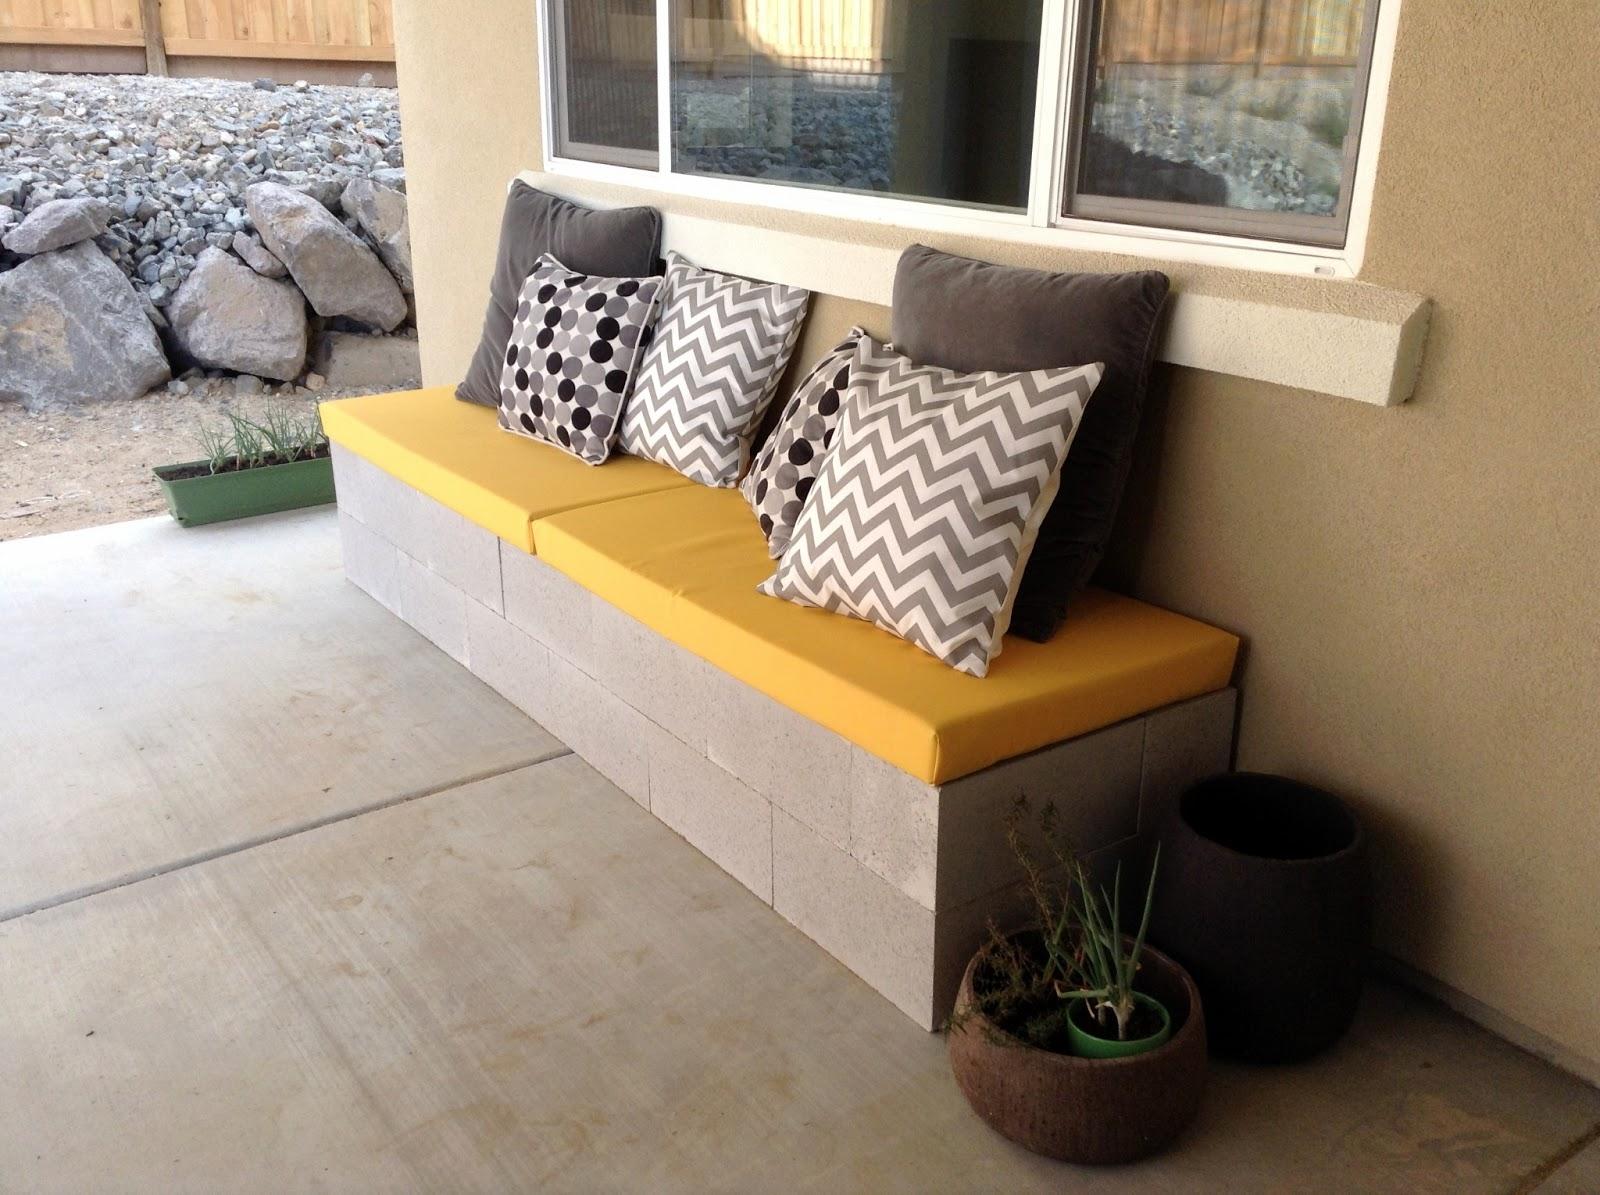 homemade modern ep 70 outdoor sofa sofascore today hello daly mini patio project cinder block bench